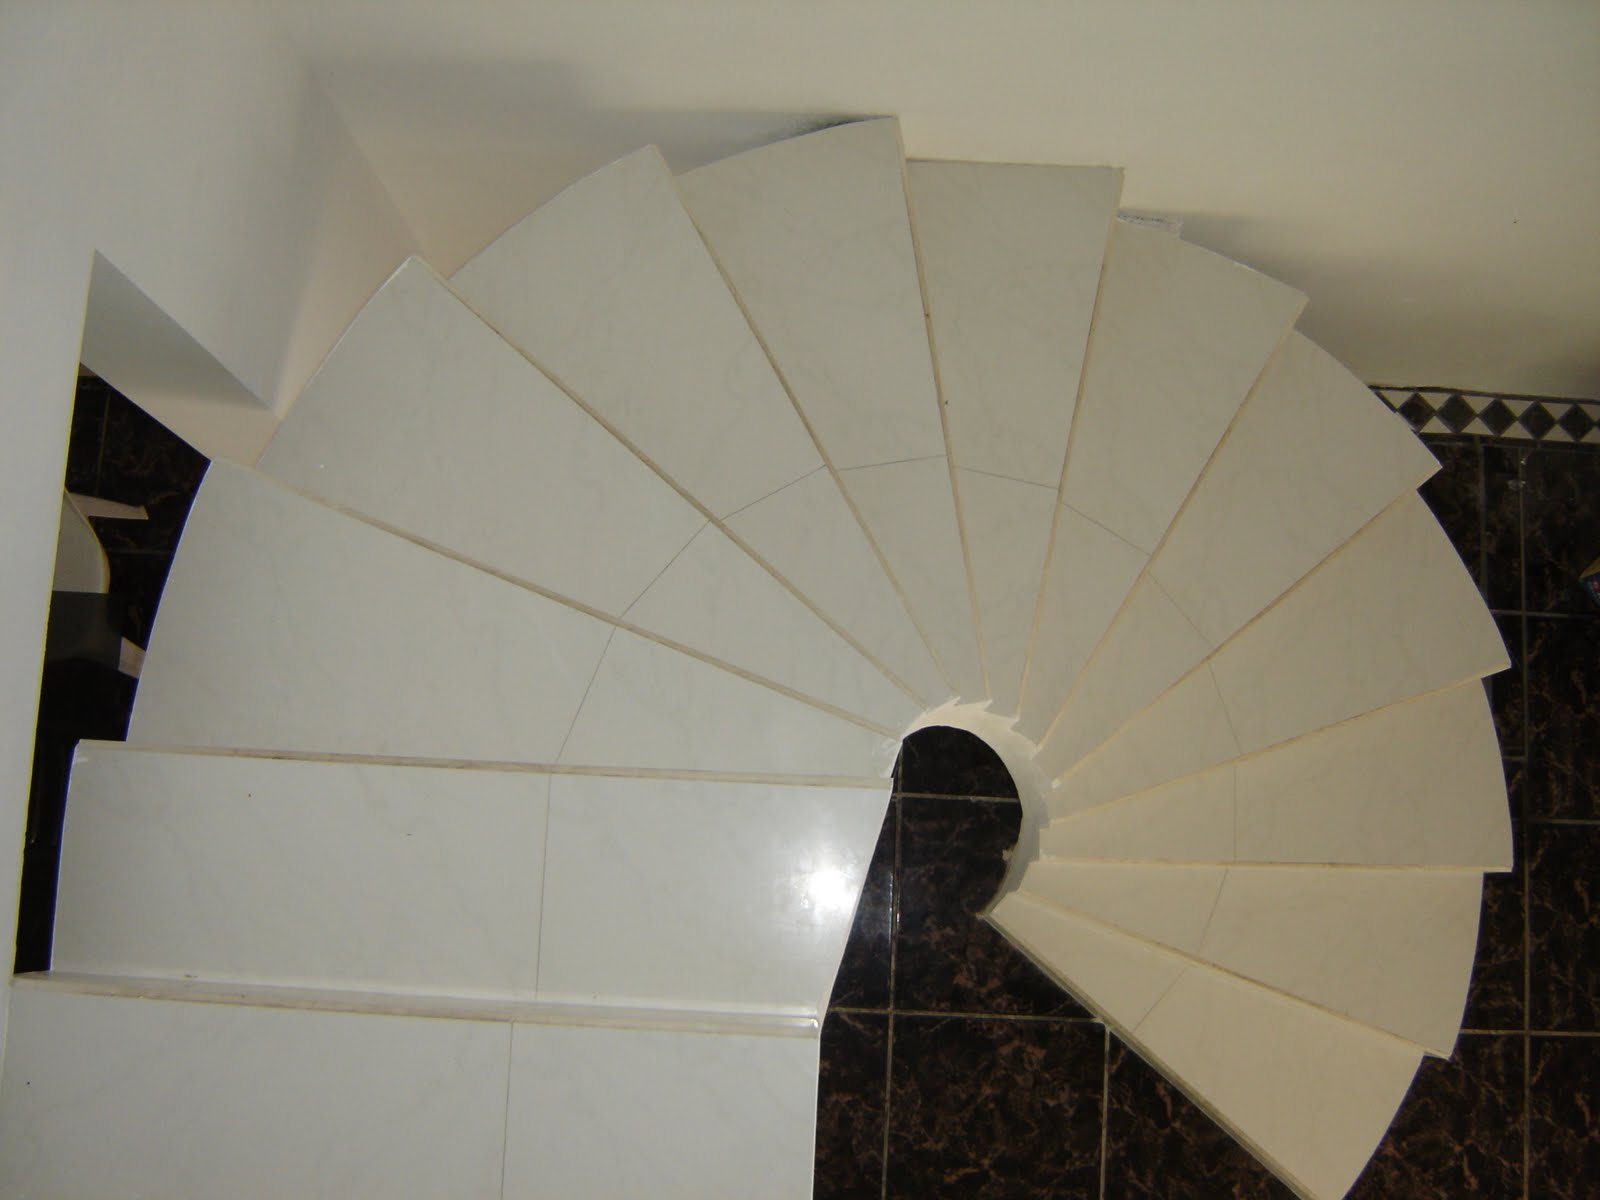 Remodelando tepic escalera con piso rectificado for Escalera caracol 2 pisos